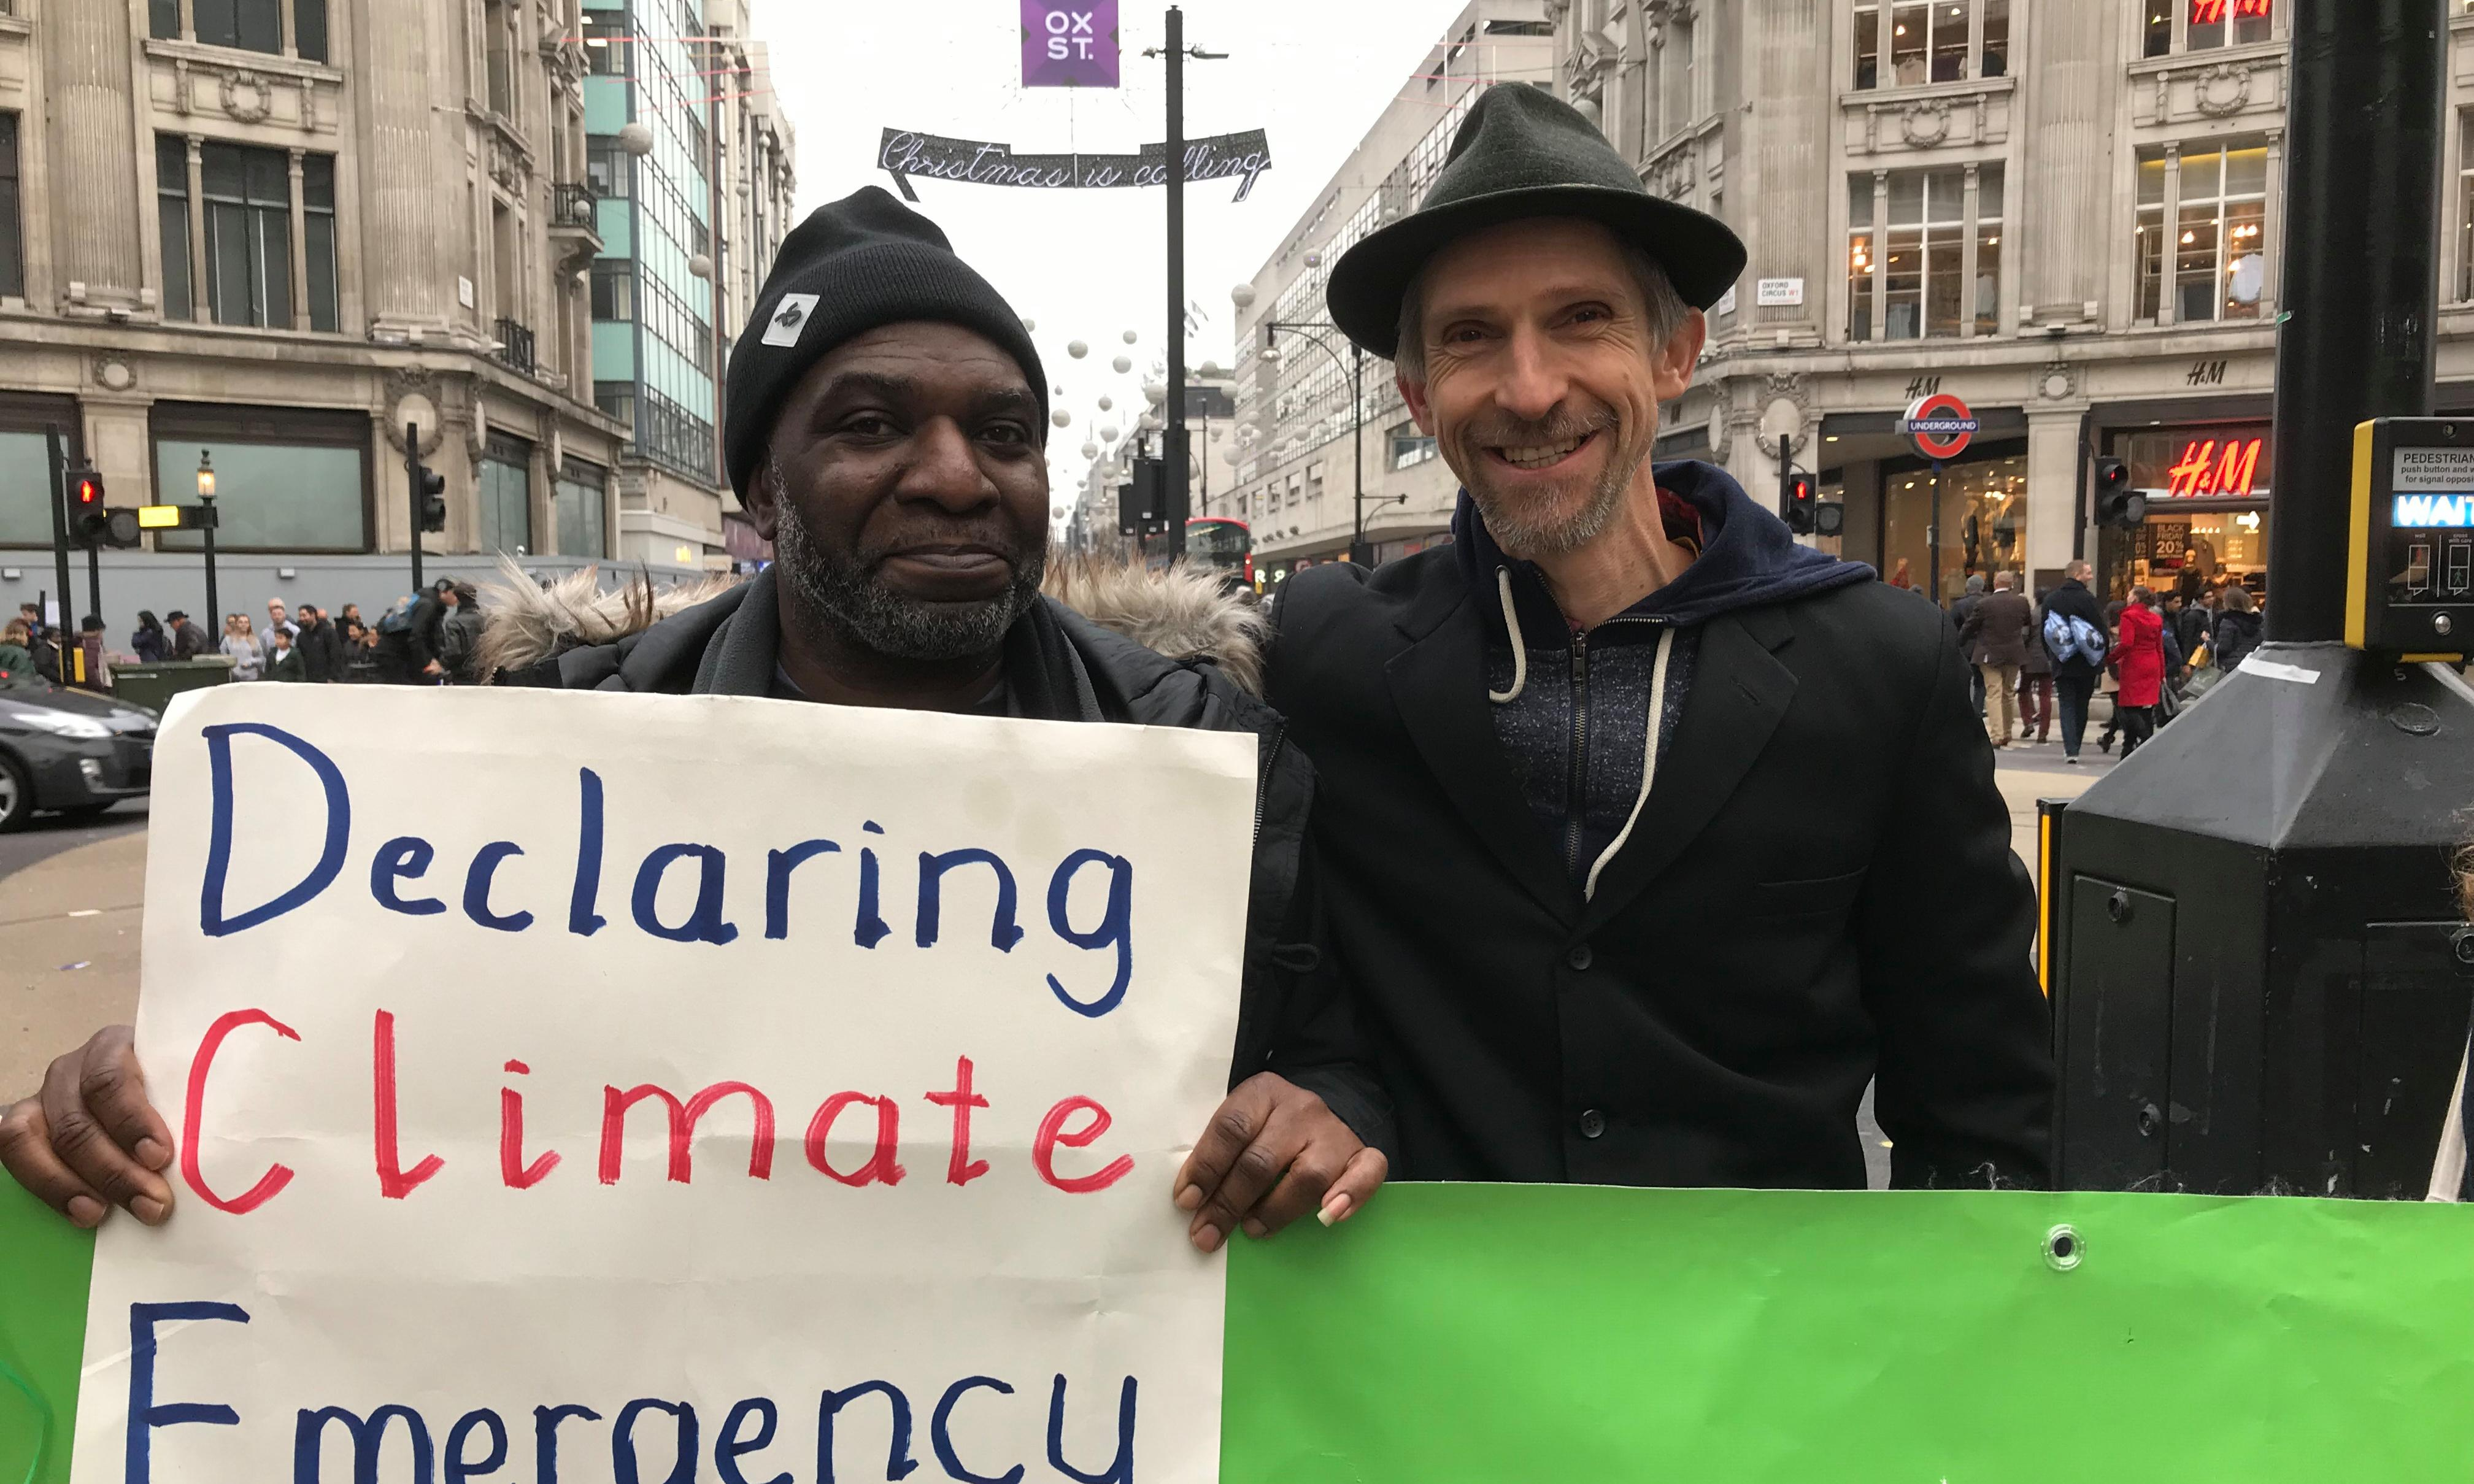 'I've waited 25 years for a movement like Extinction Rebellion'